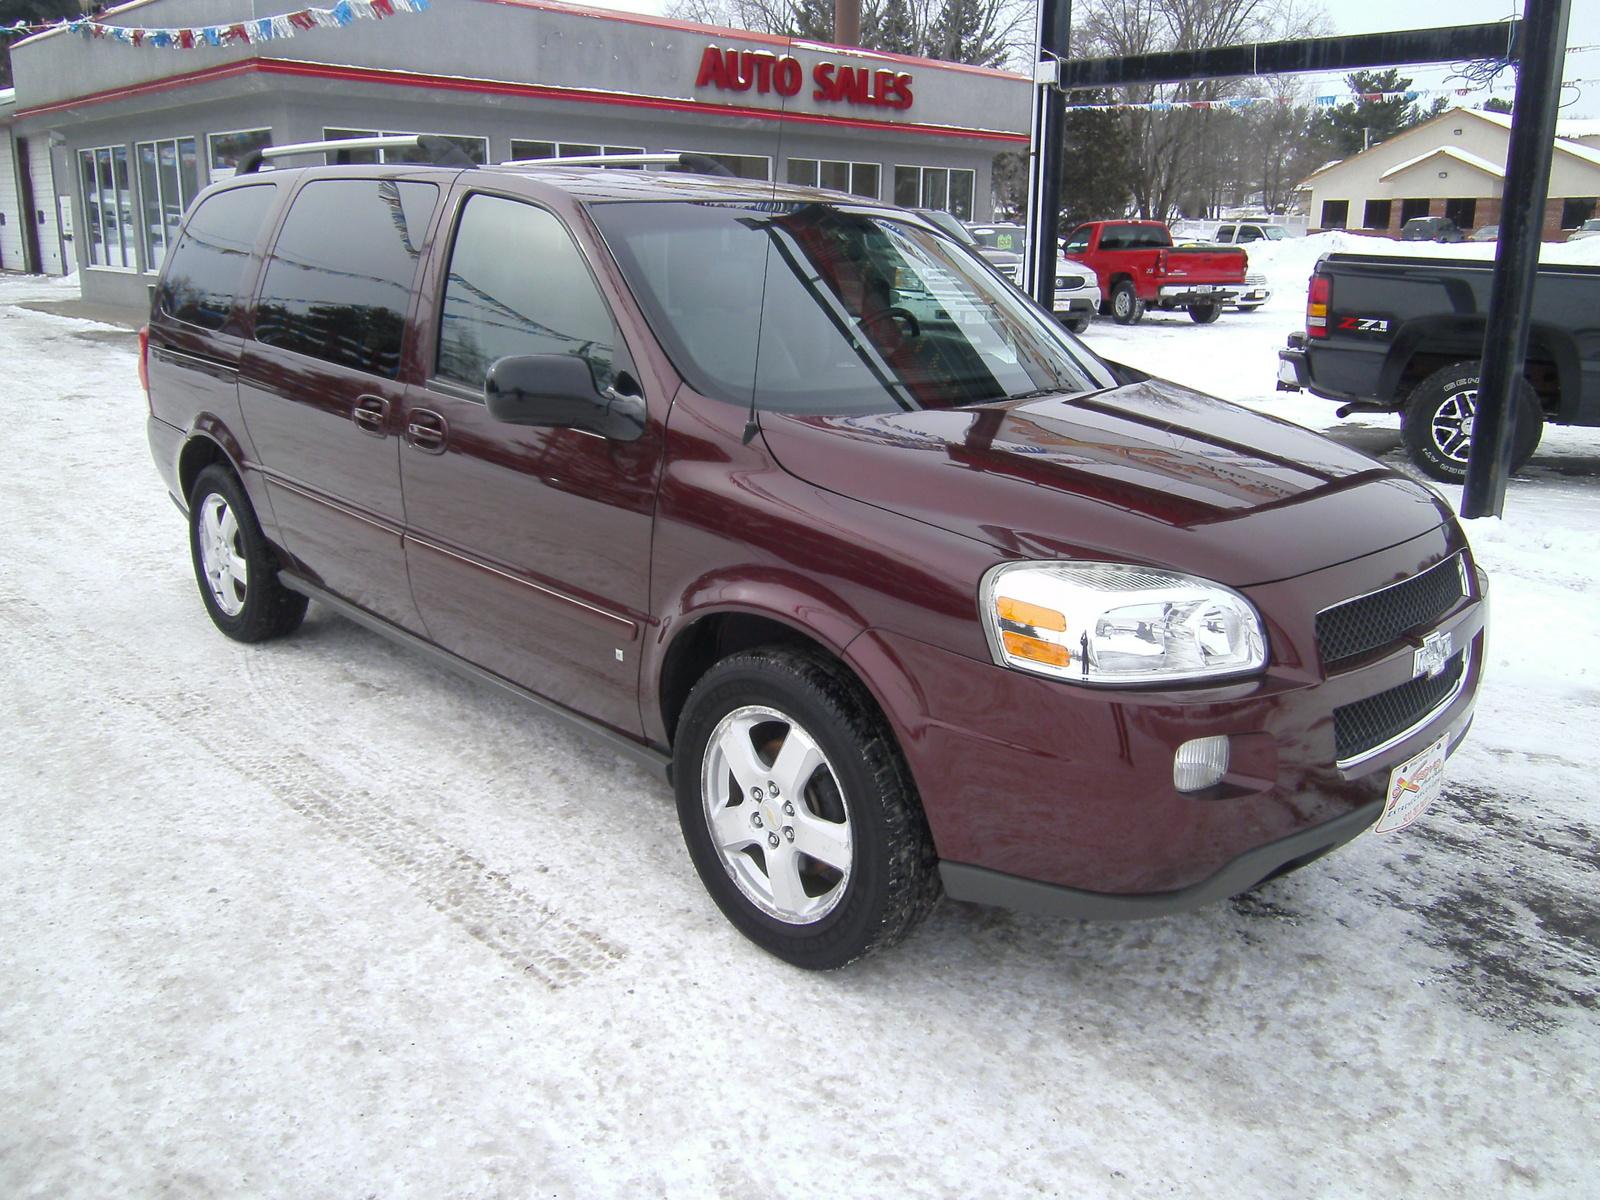 2007 Chevrolet Uplander - Exterior Pictures